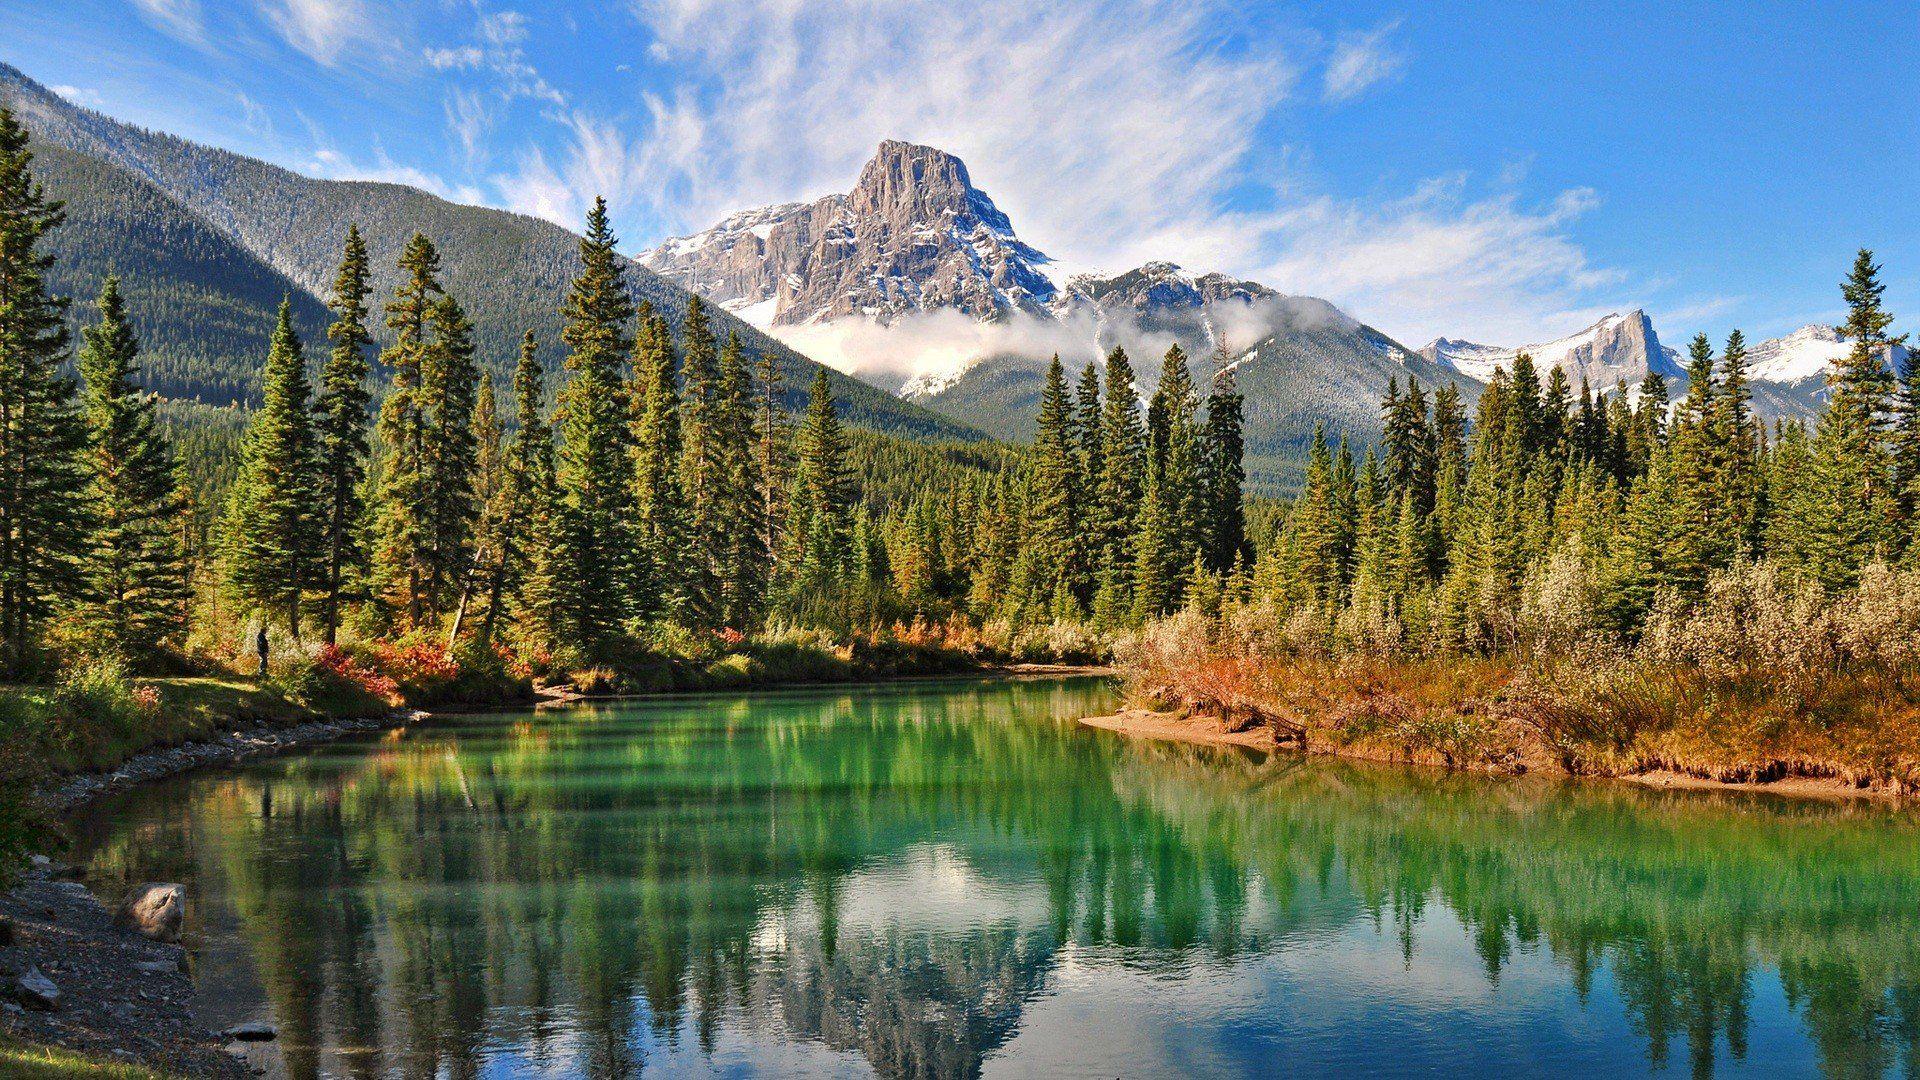 Mountain nature landscape cloud lake tree reflection river rock hd 4k ultrahd wallpaper ...